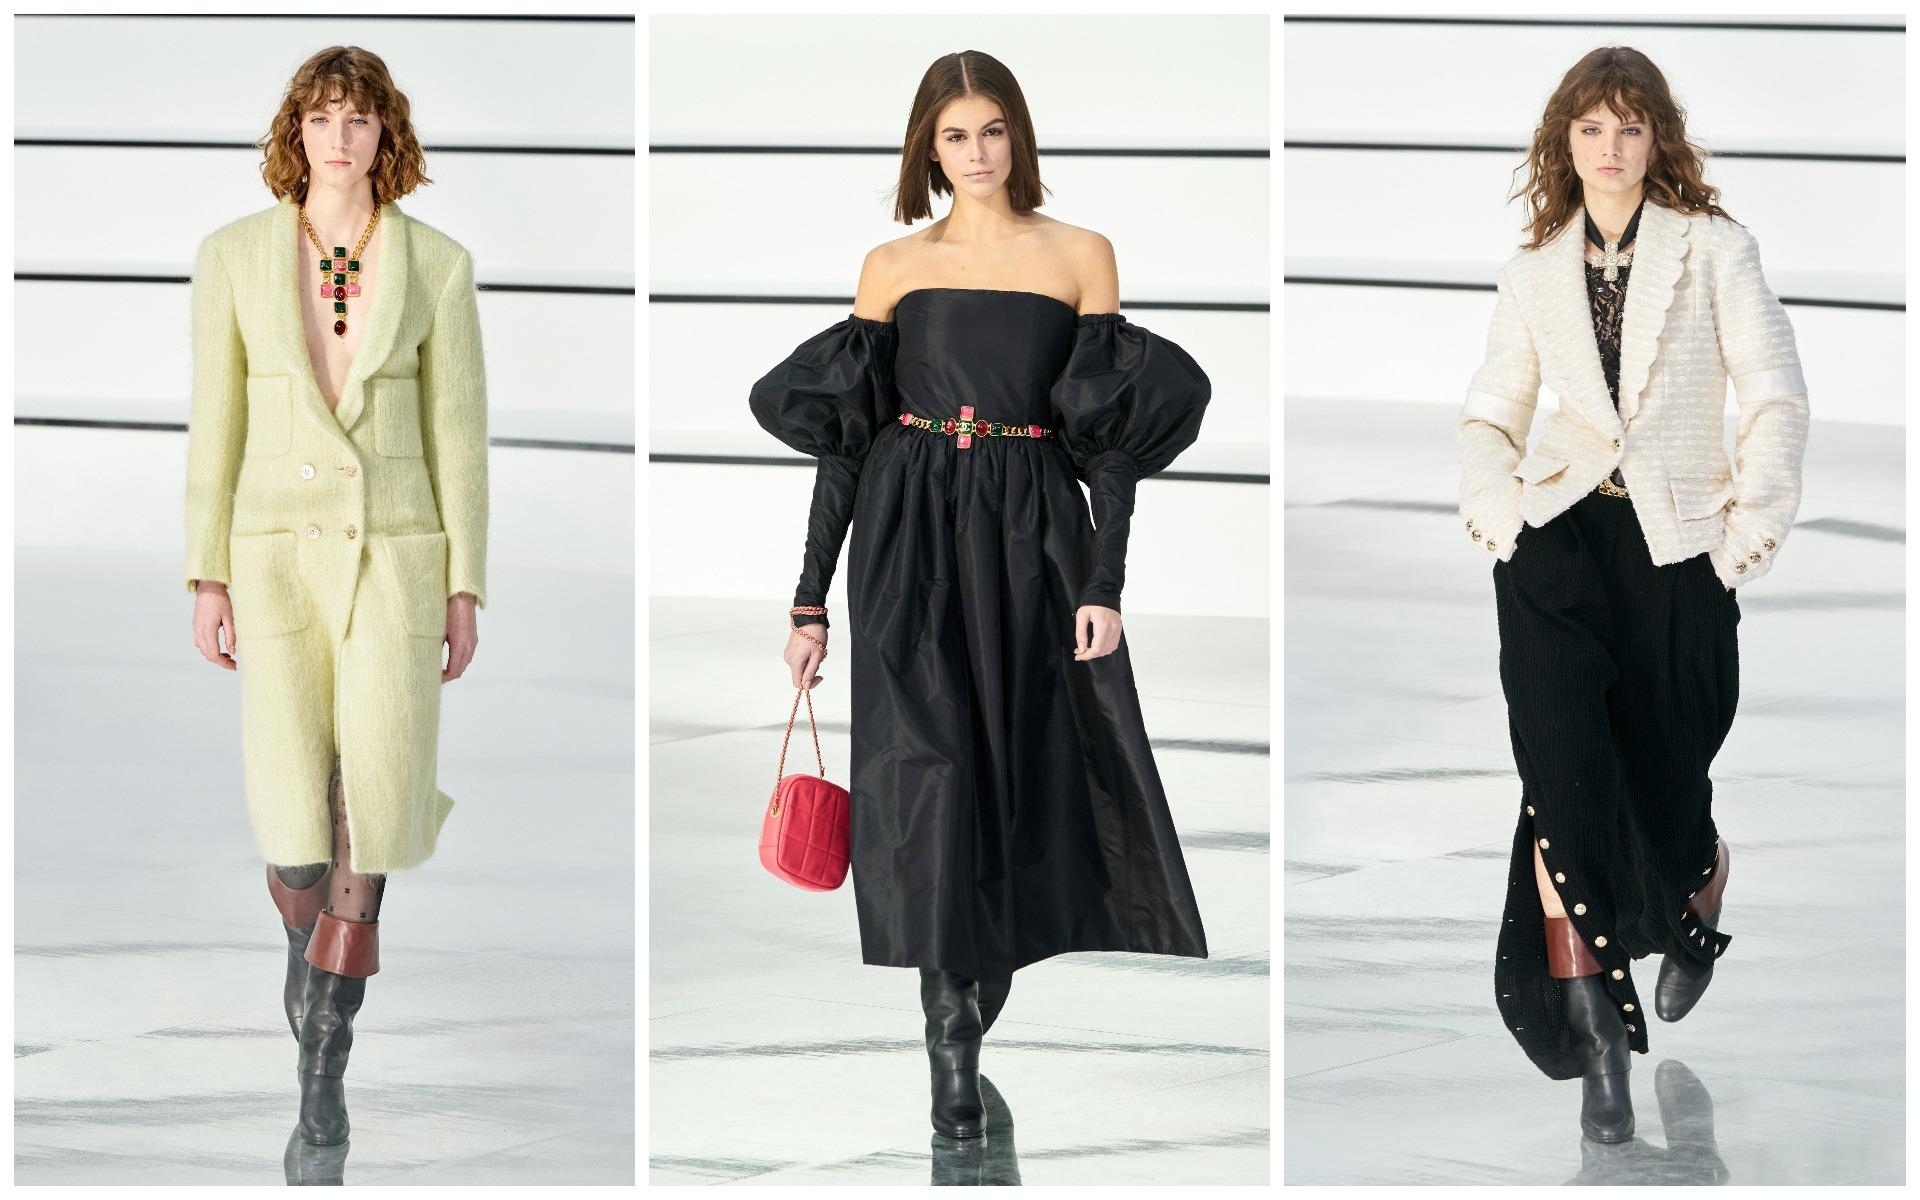 Chanel FW 2020/21